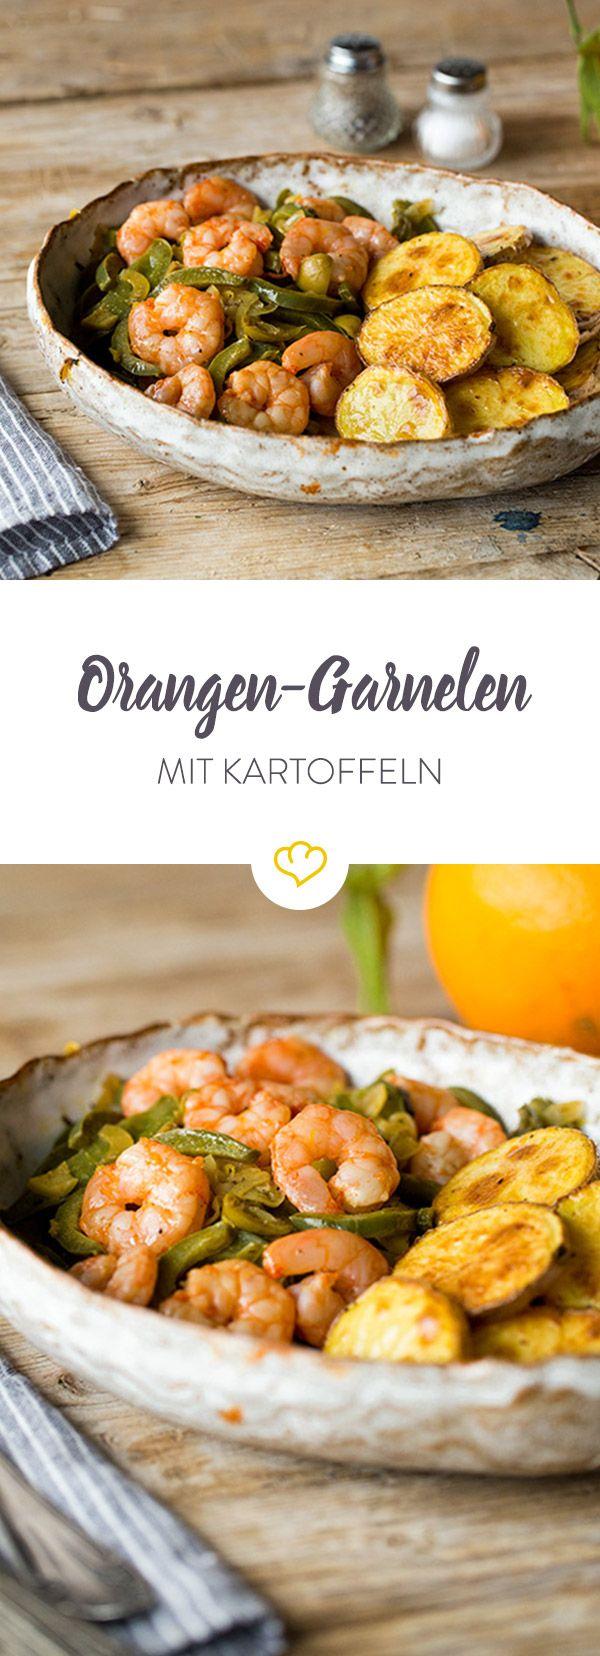 Photo of Garnelen Rezepte: 36 fangfrische Leckerbissen aus dem Meer